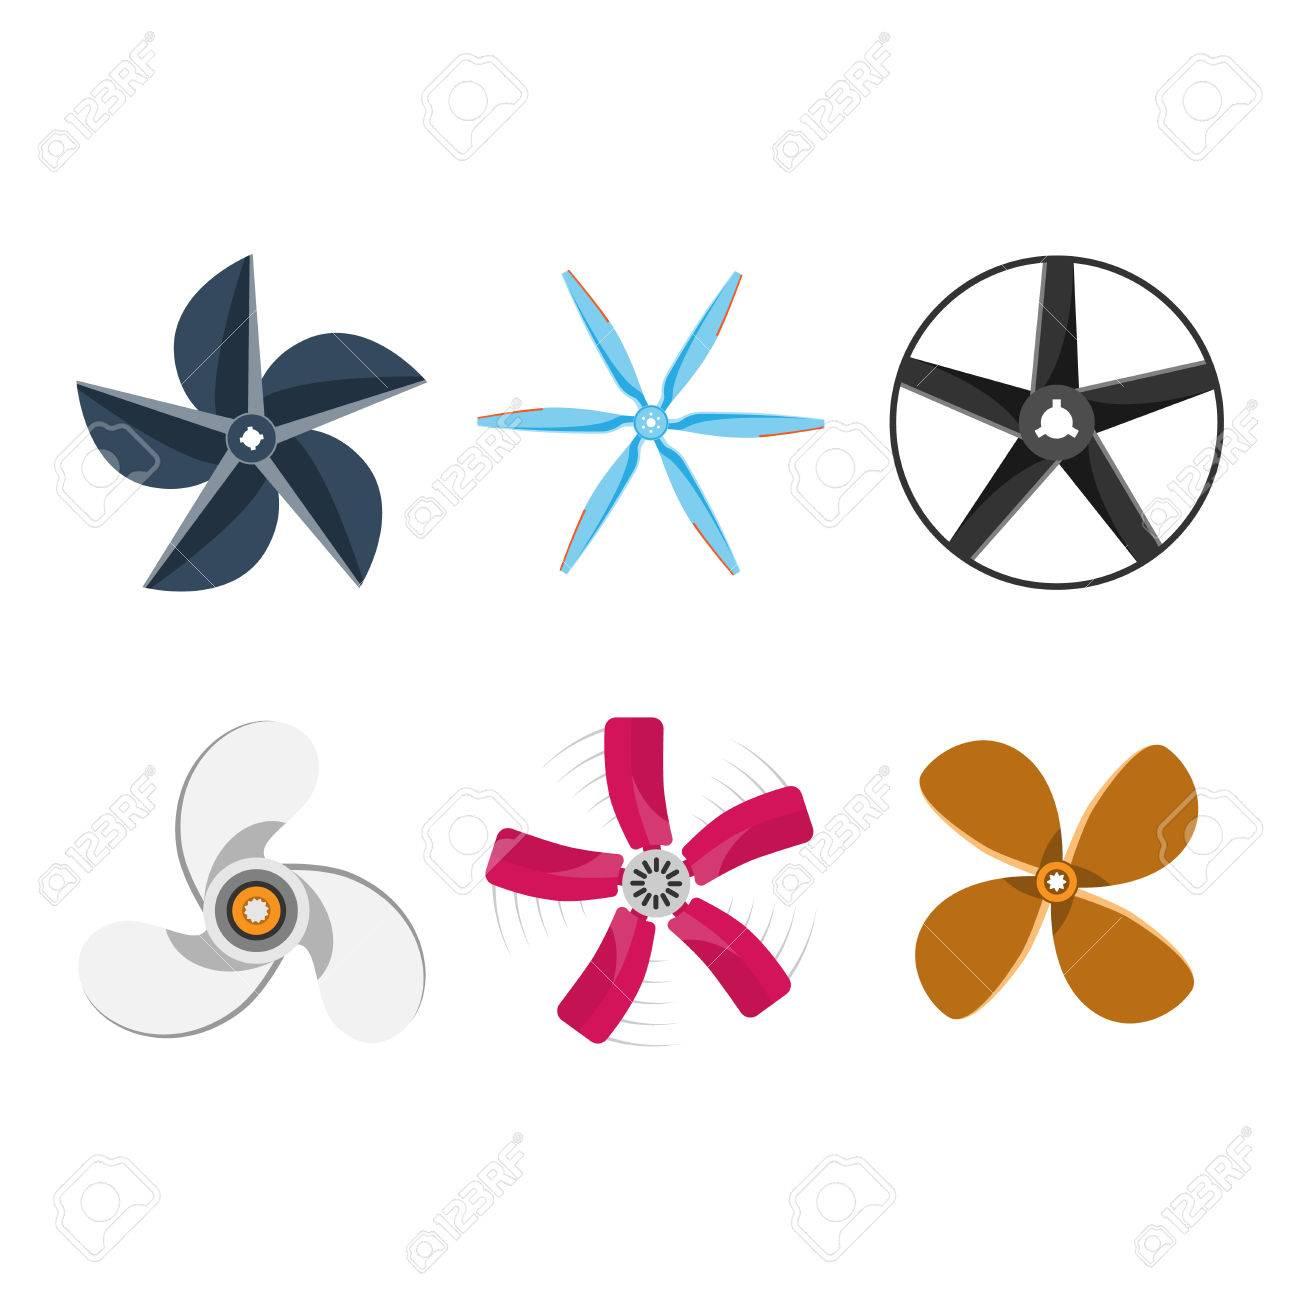 Turbinen-Symbole Propellerlüfterdrehtechnik Ausrüstung. Lüfterflügel ...